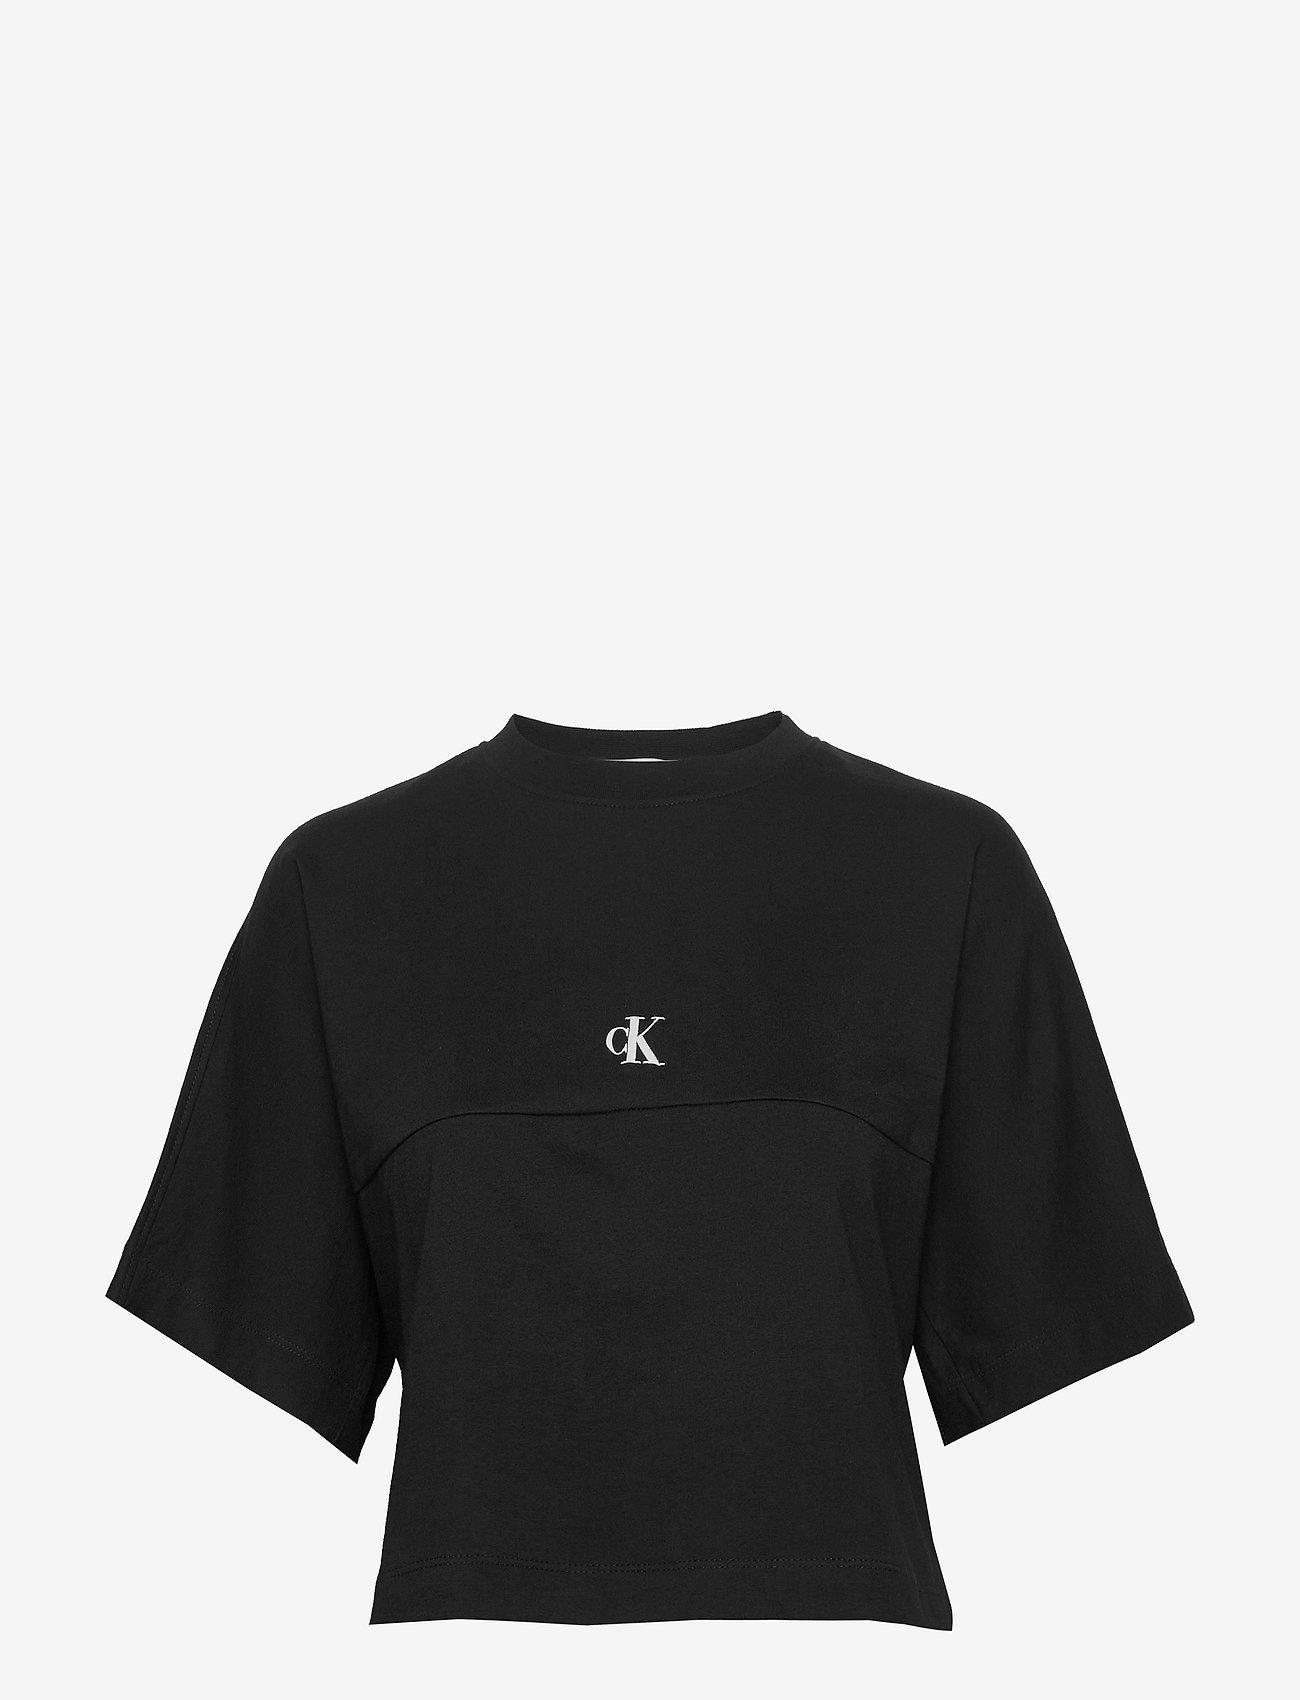 Calvin Klein Jeans - PUFF PRINT BACK LOGO T-SHIRT - crop tops - ck black - 0